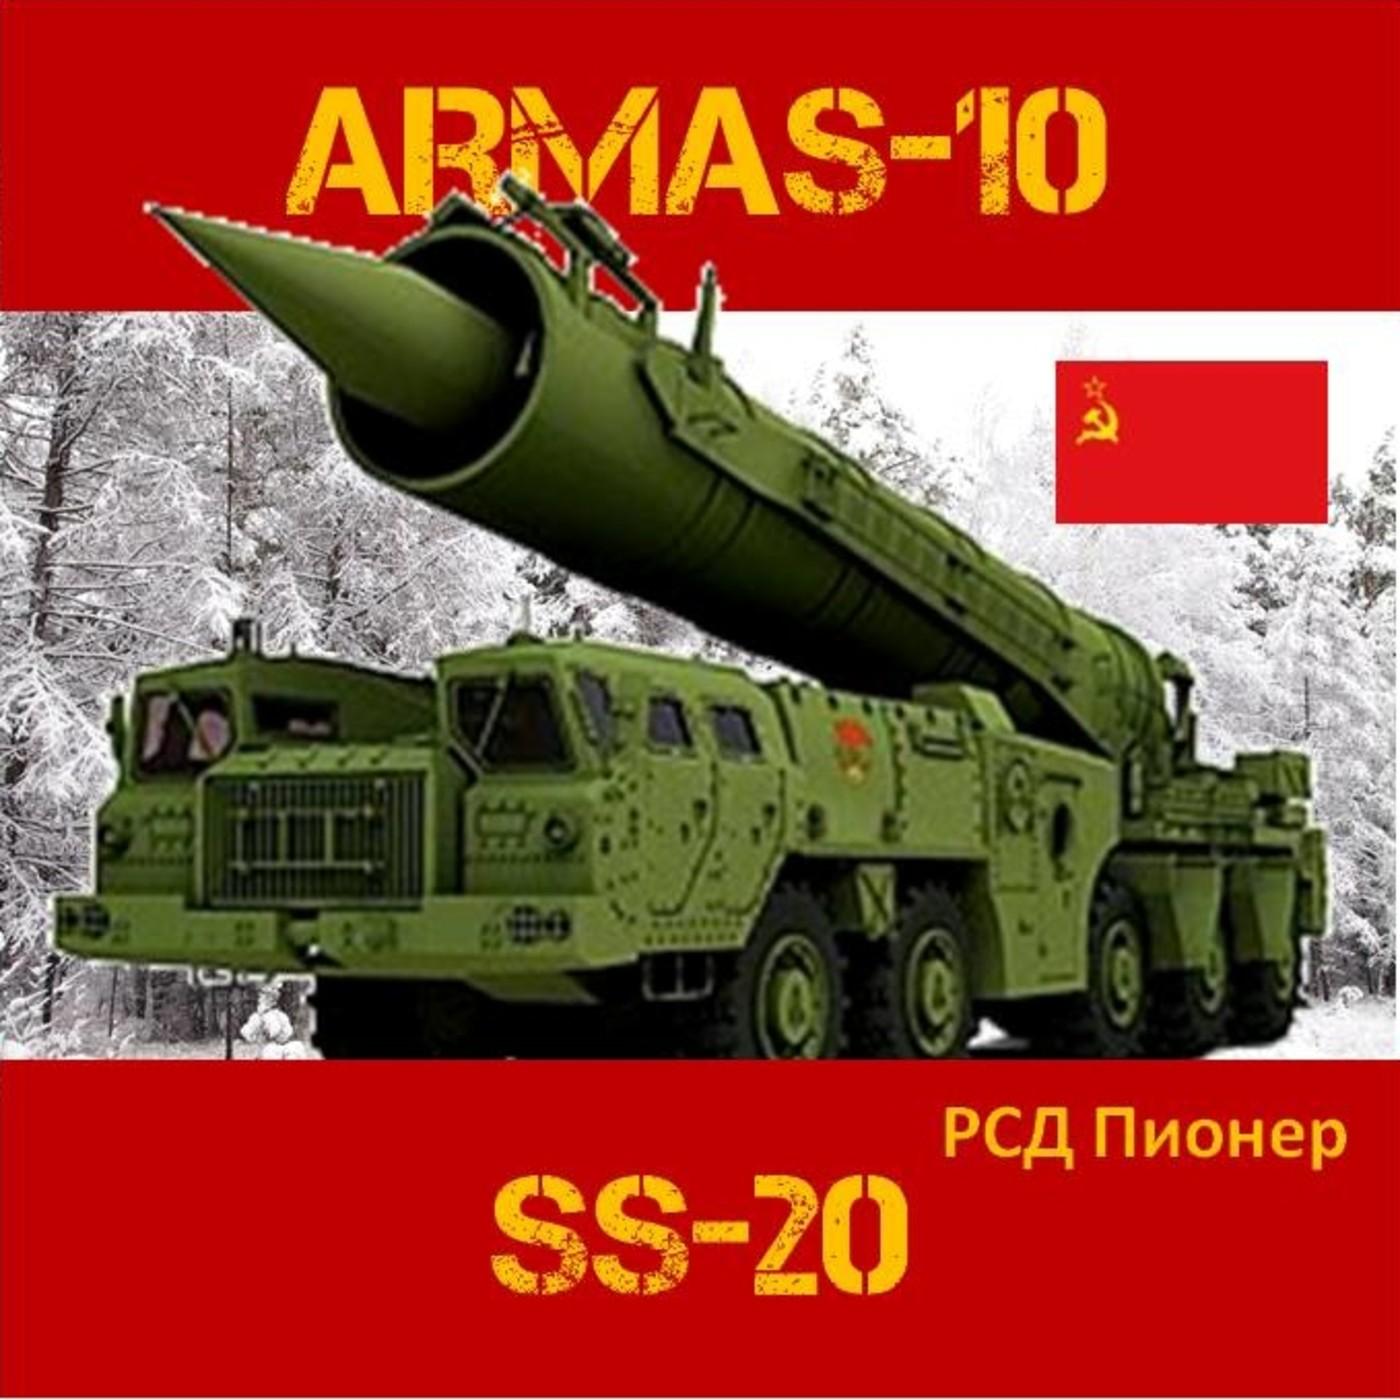 ARMAS-10#06 SS 20 (RSD-10) el misil que aterrorizó a la OTAN - URSS Rearme Silos